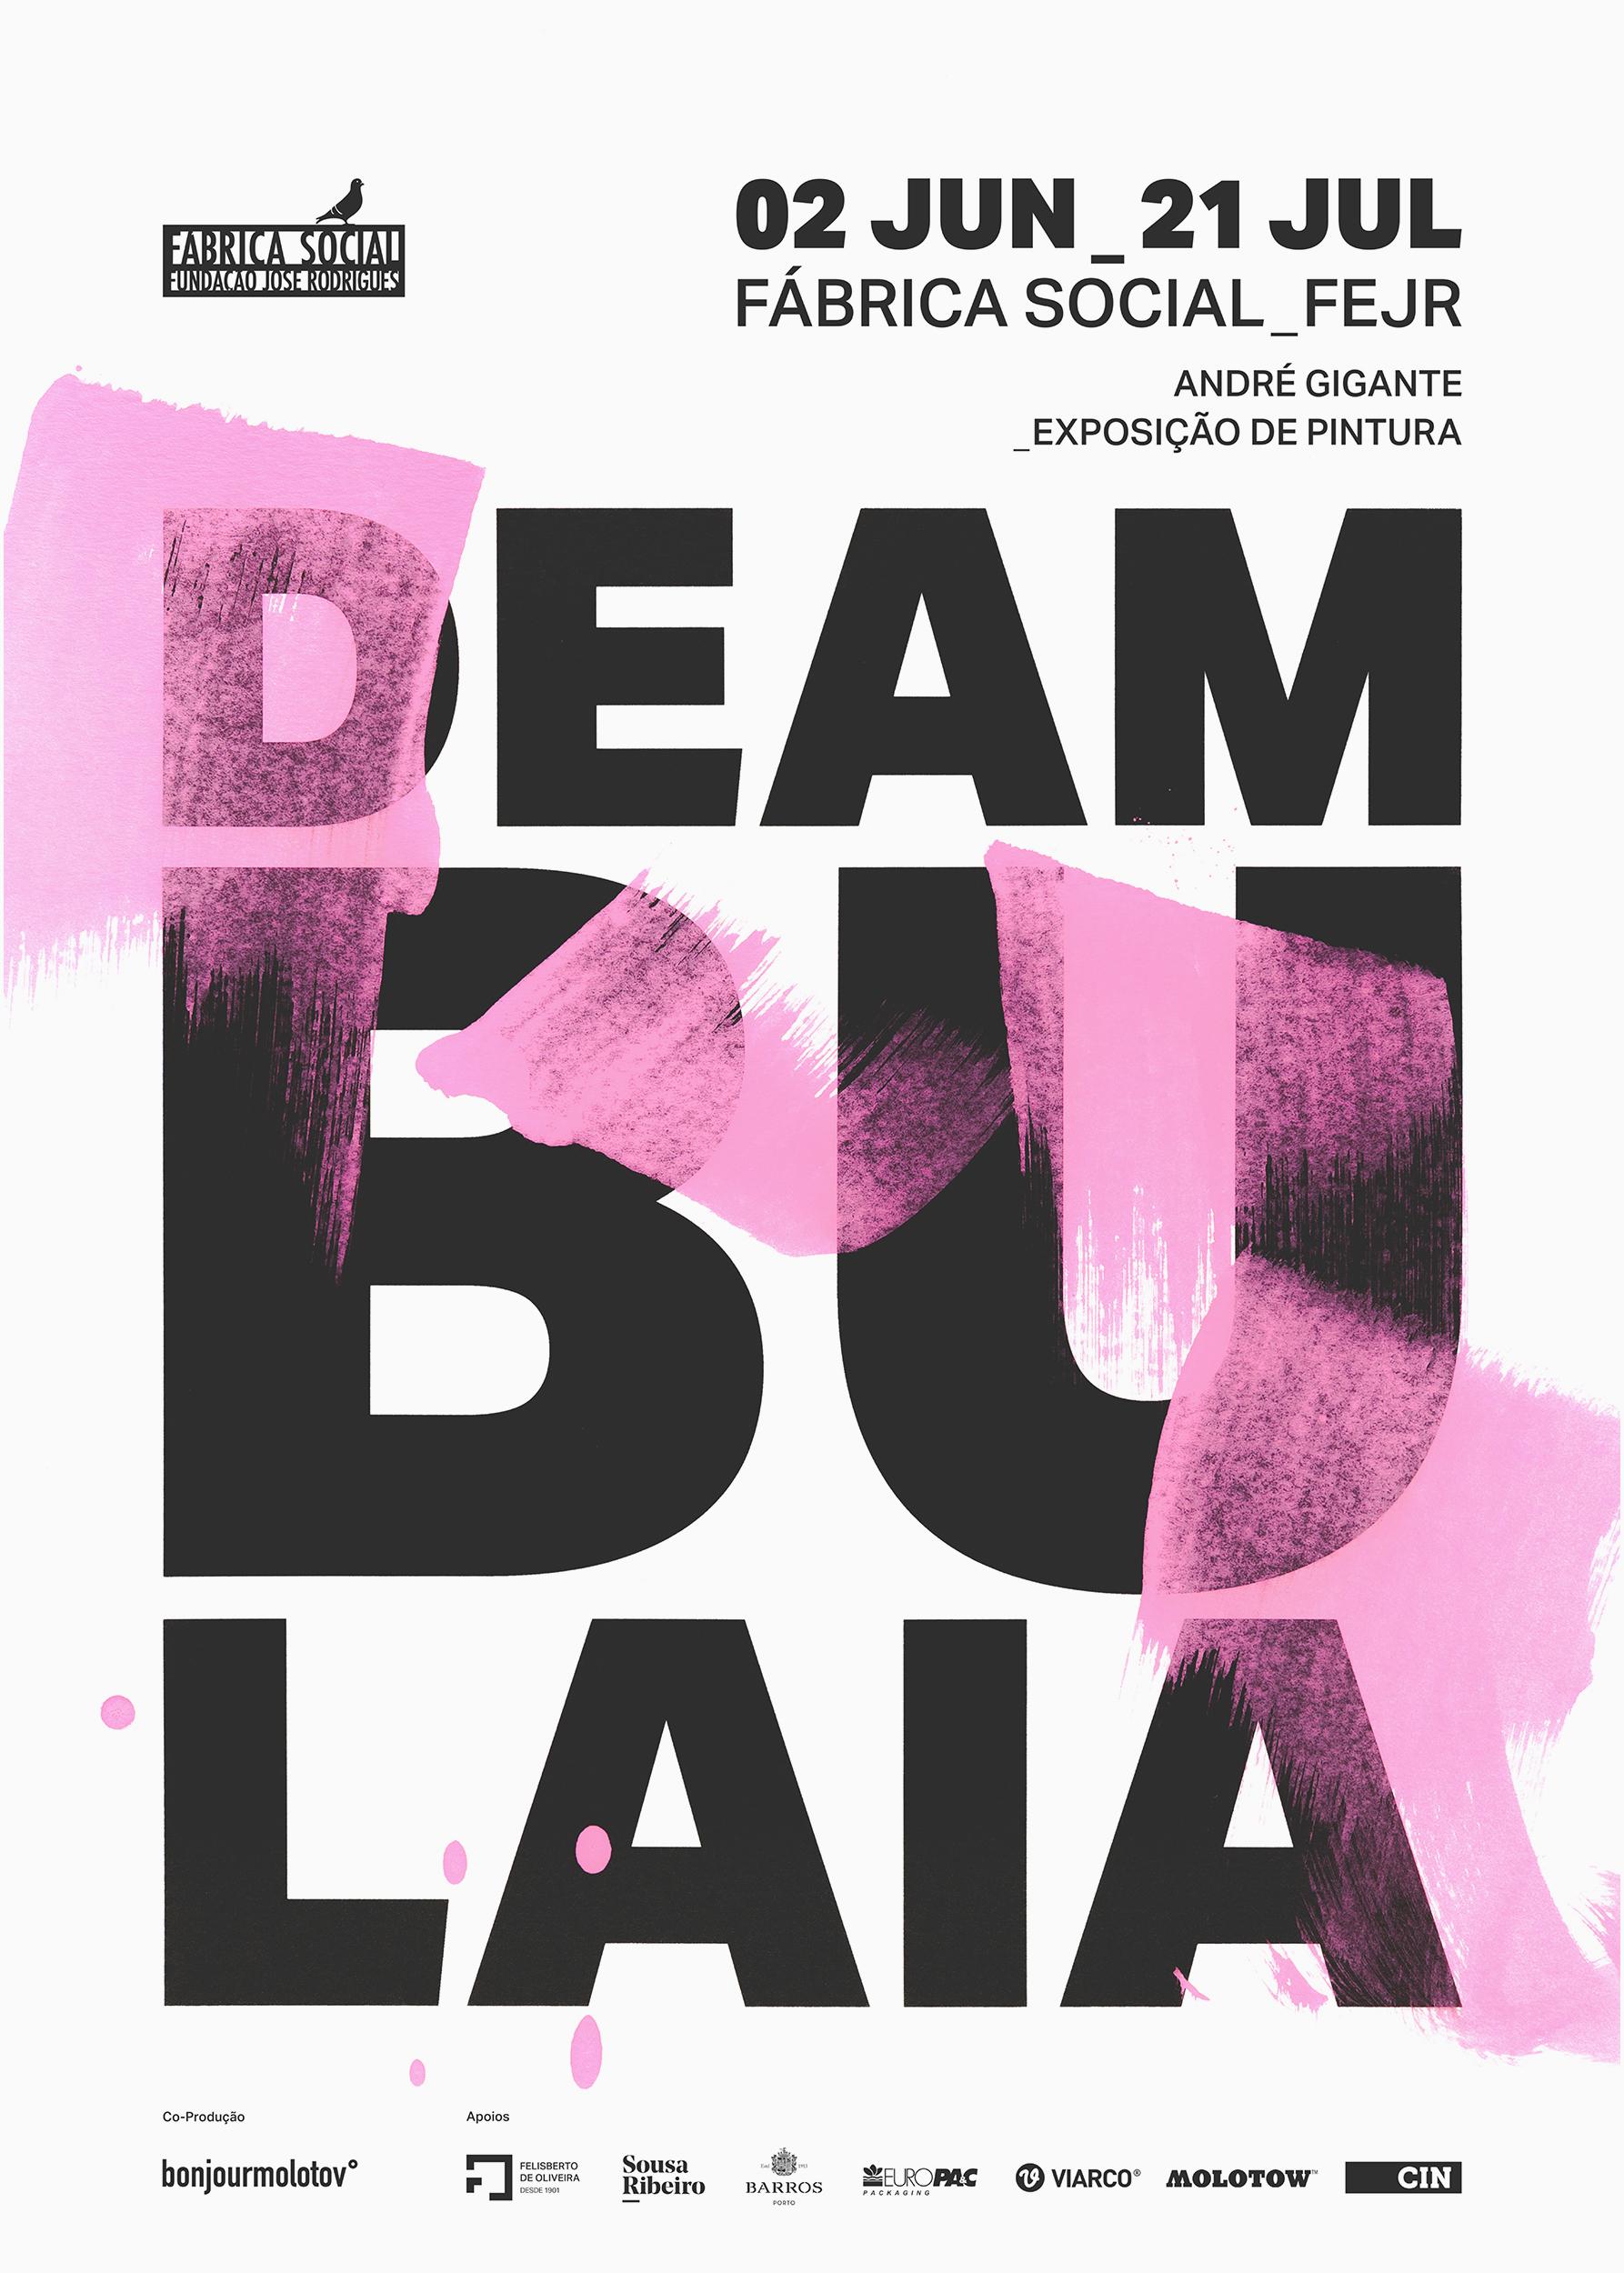 Deambulaia+Exhibition+Andre+Gigante+Pintura+Painting+bonjourmolotov.jpg